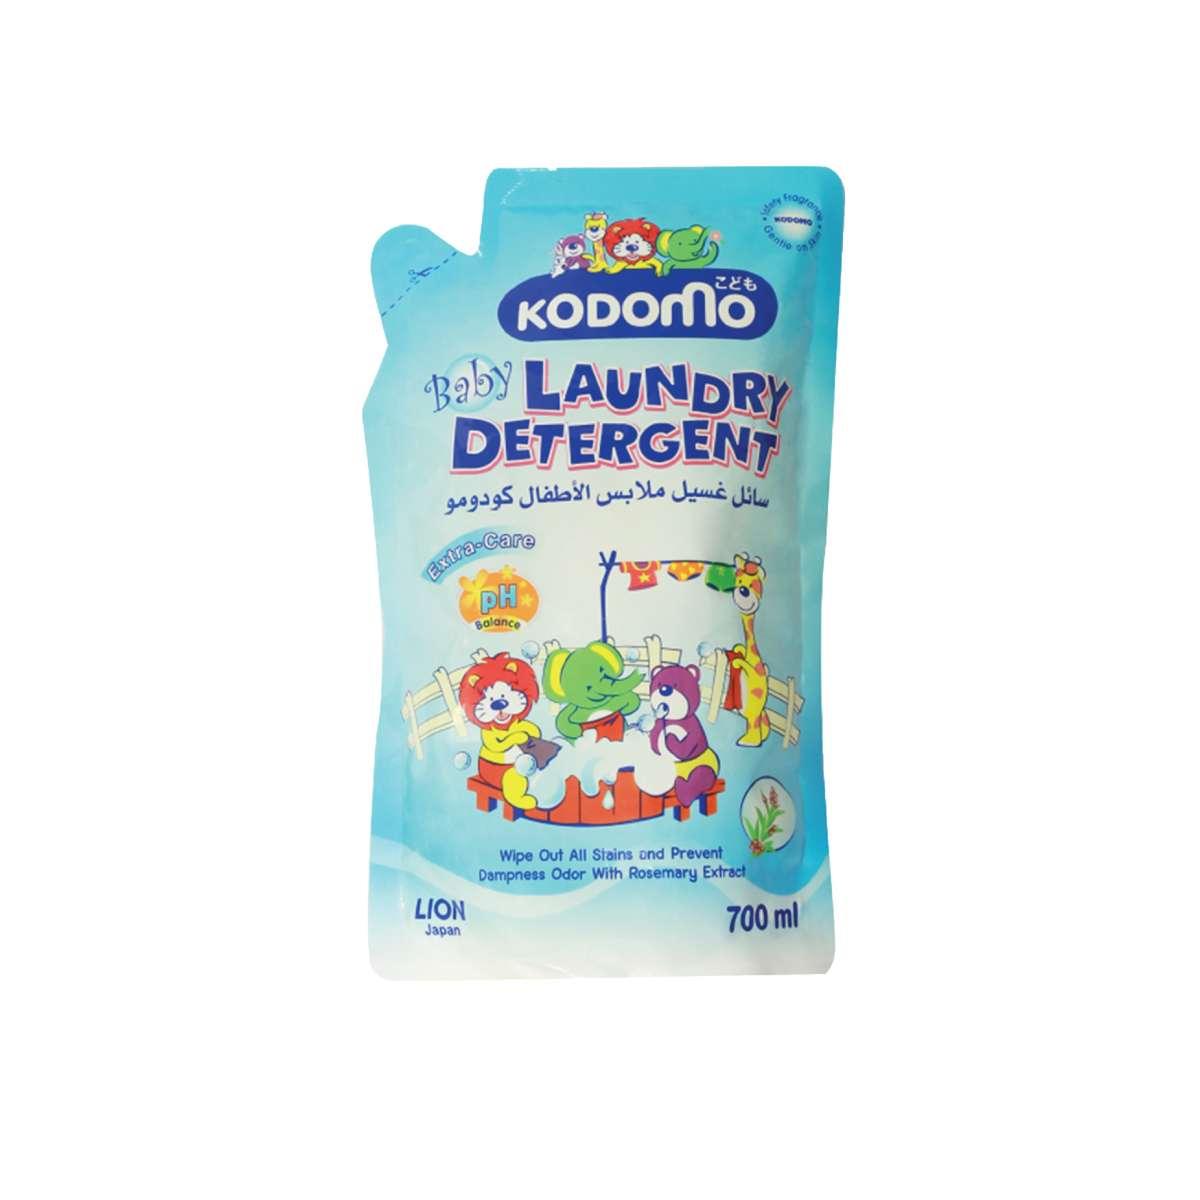 KODOMO Laundry Detergent 700 ml Refill